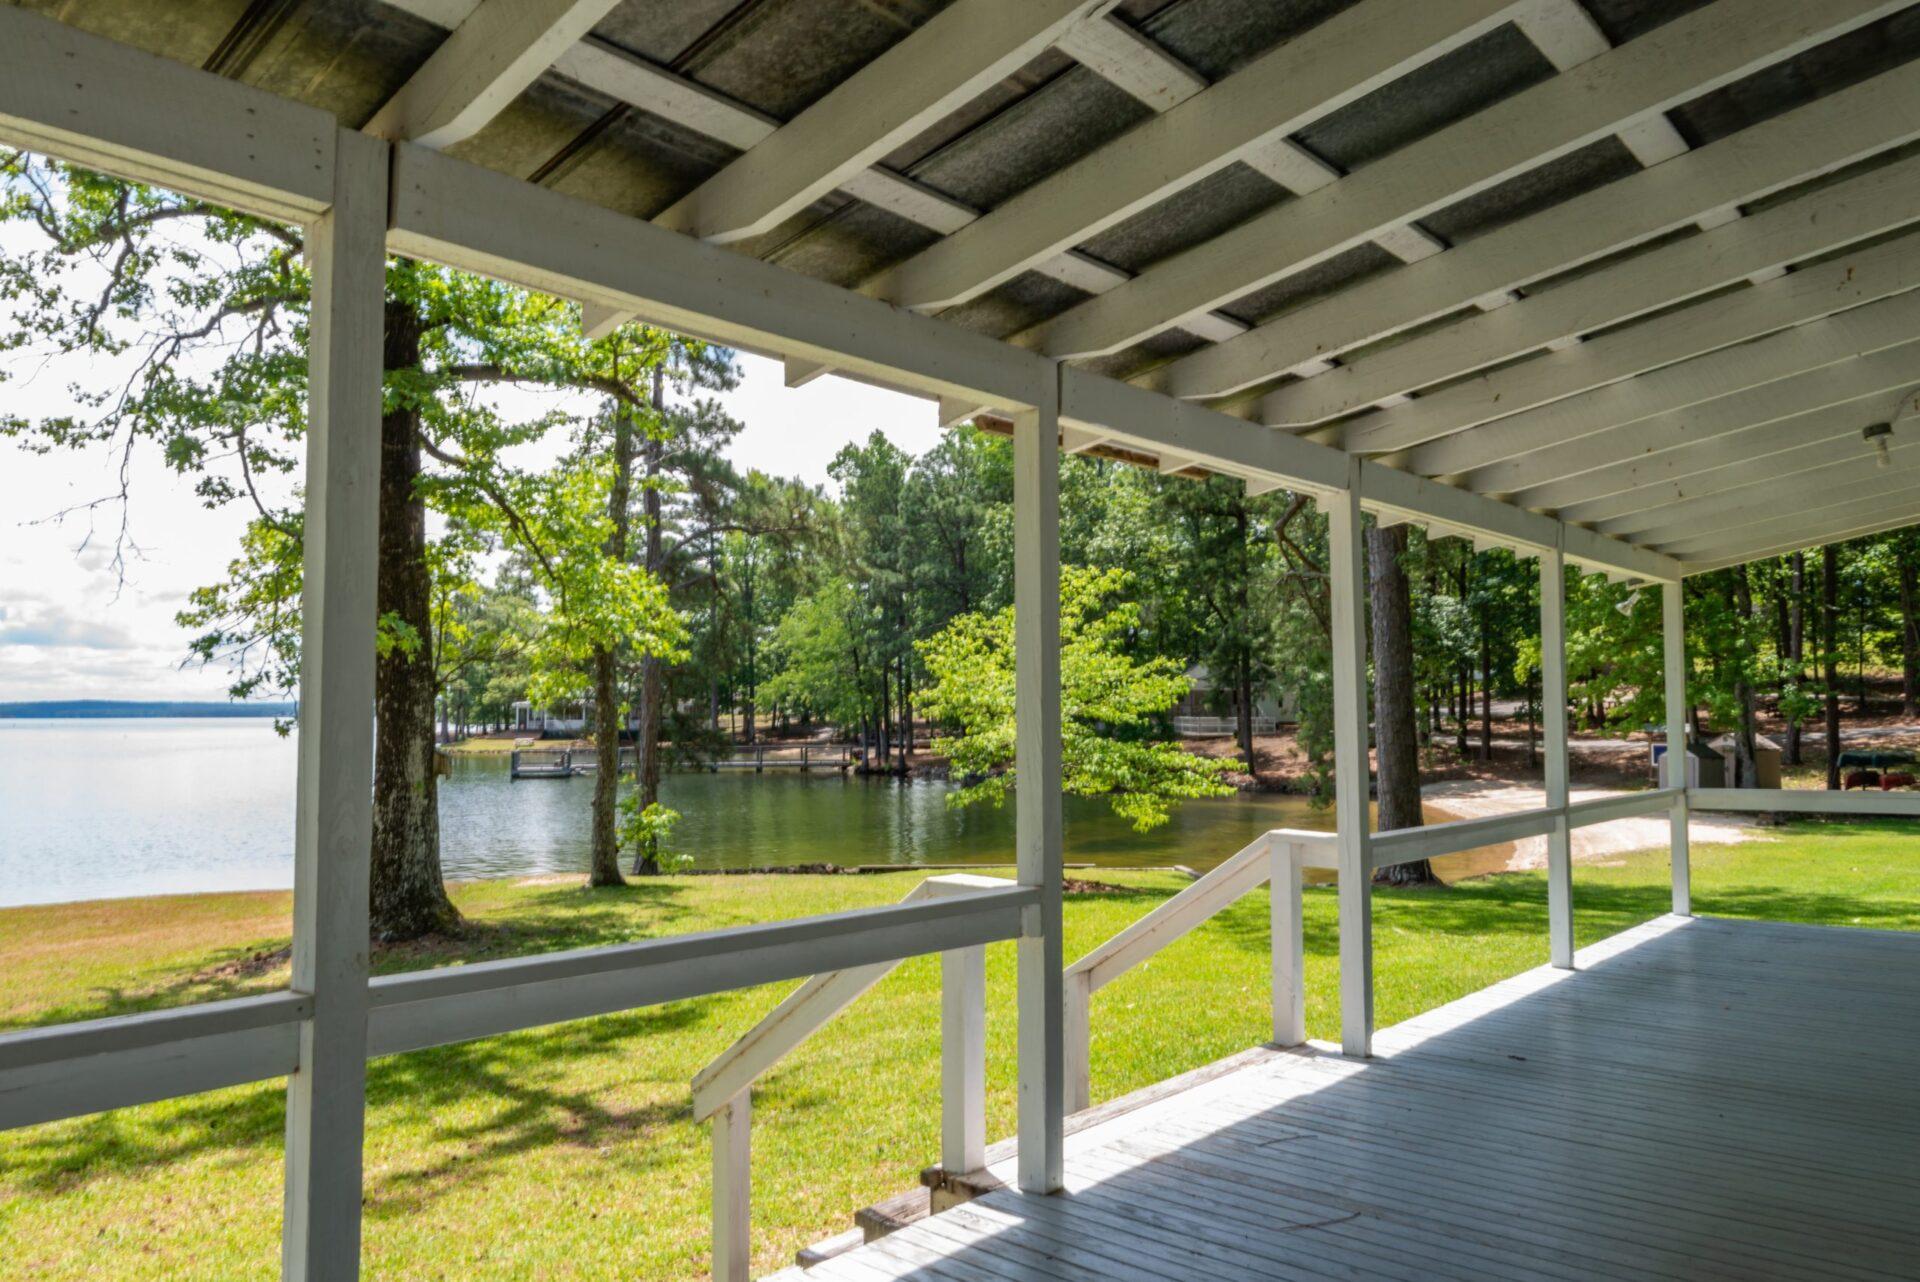 porch and lake view